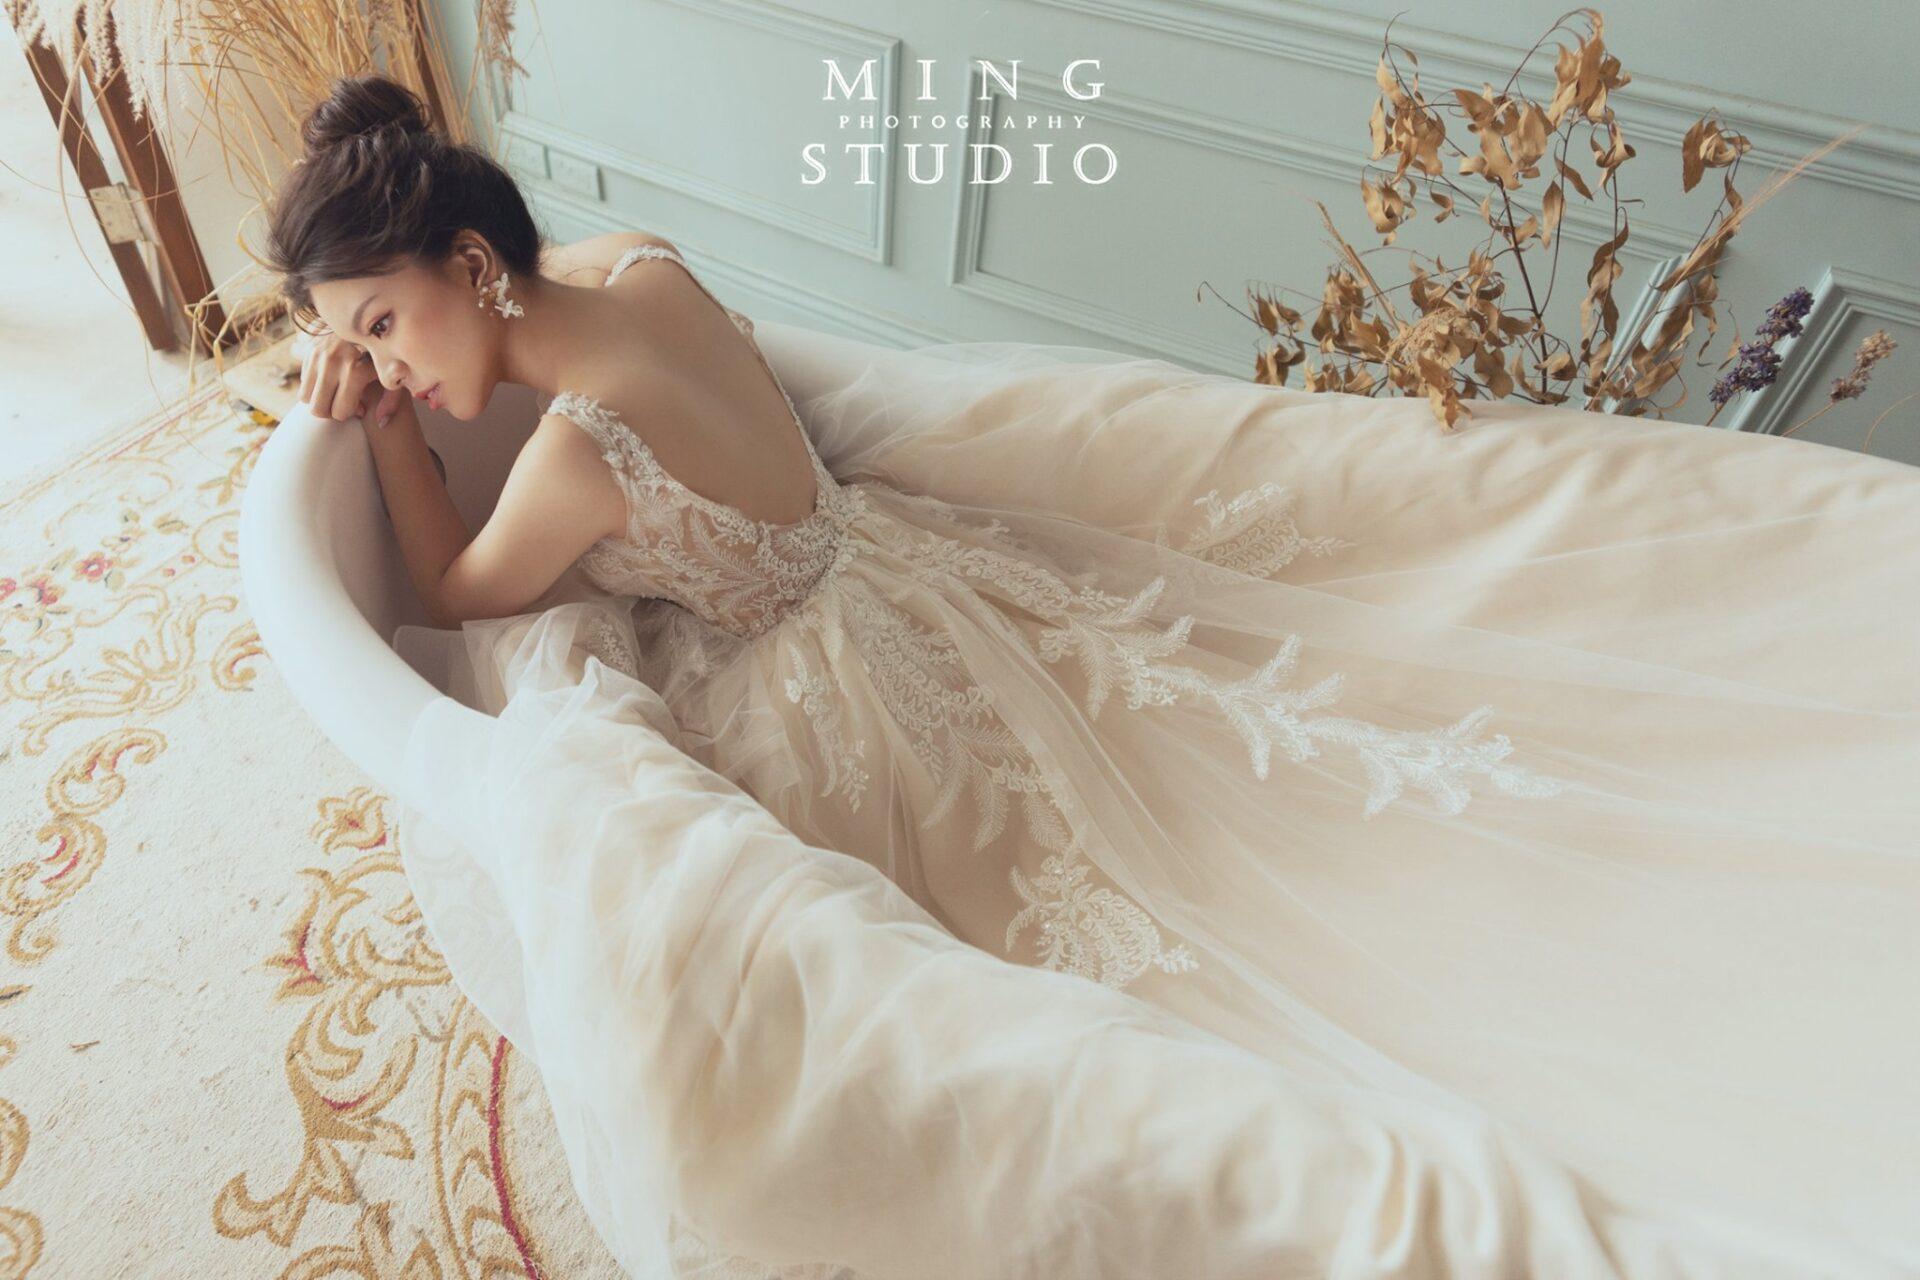 Ming.studio/明杰&佩怡 婚紗照分享